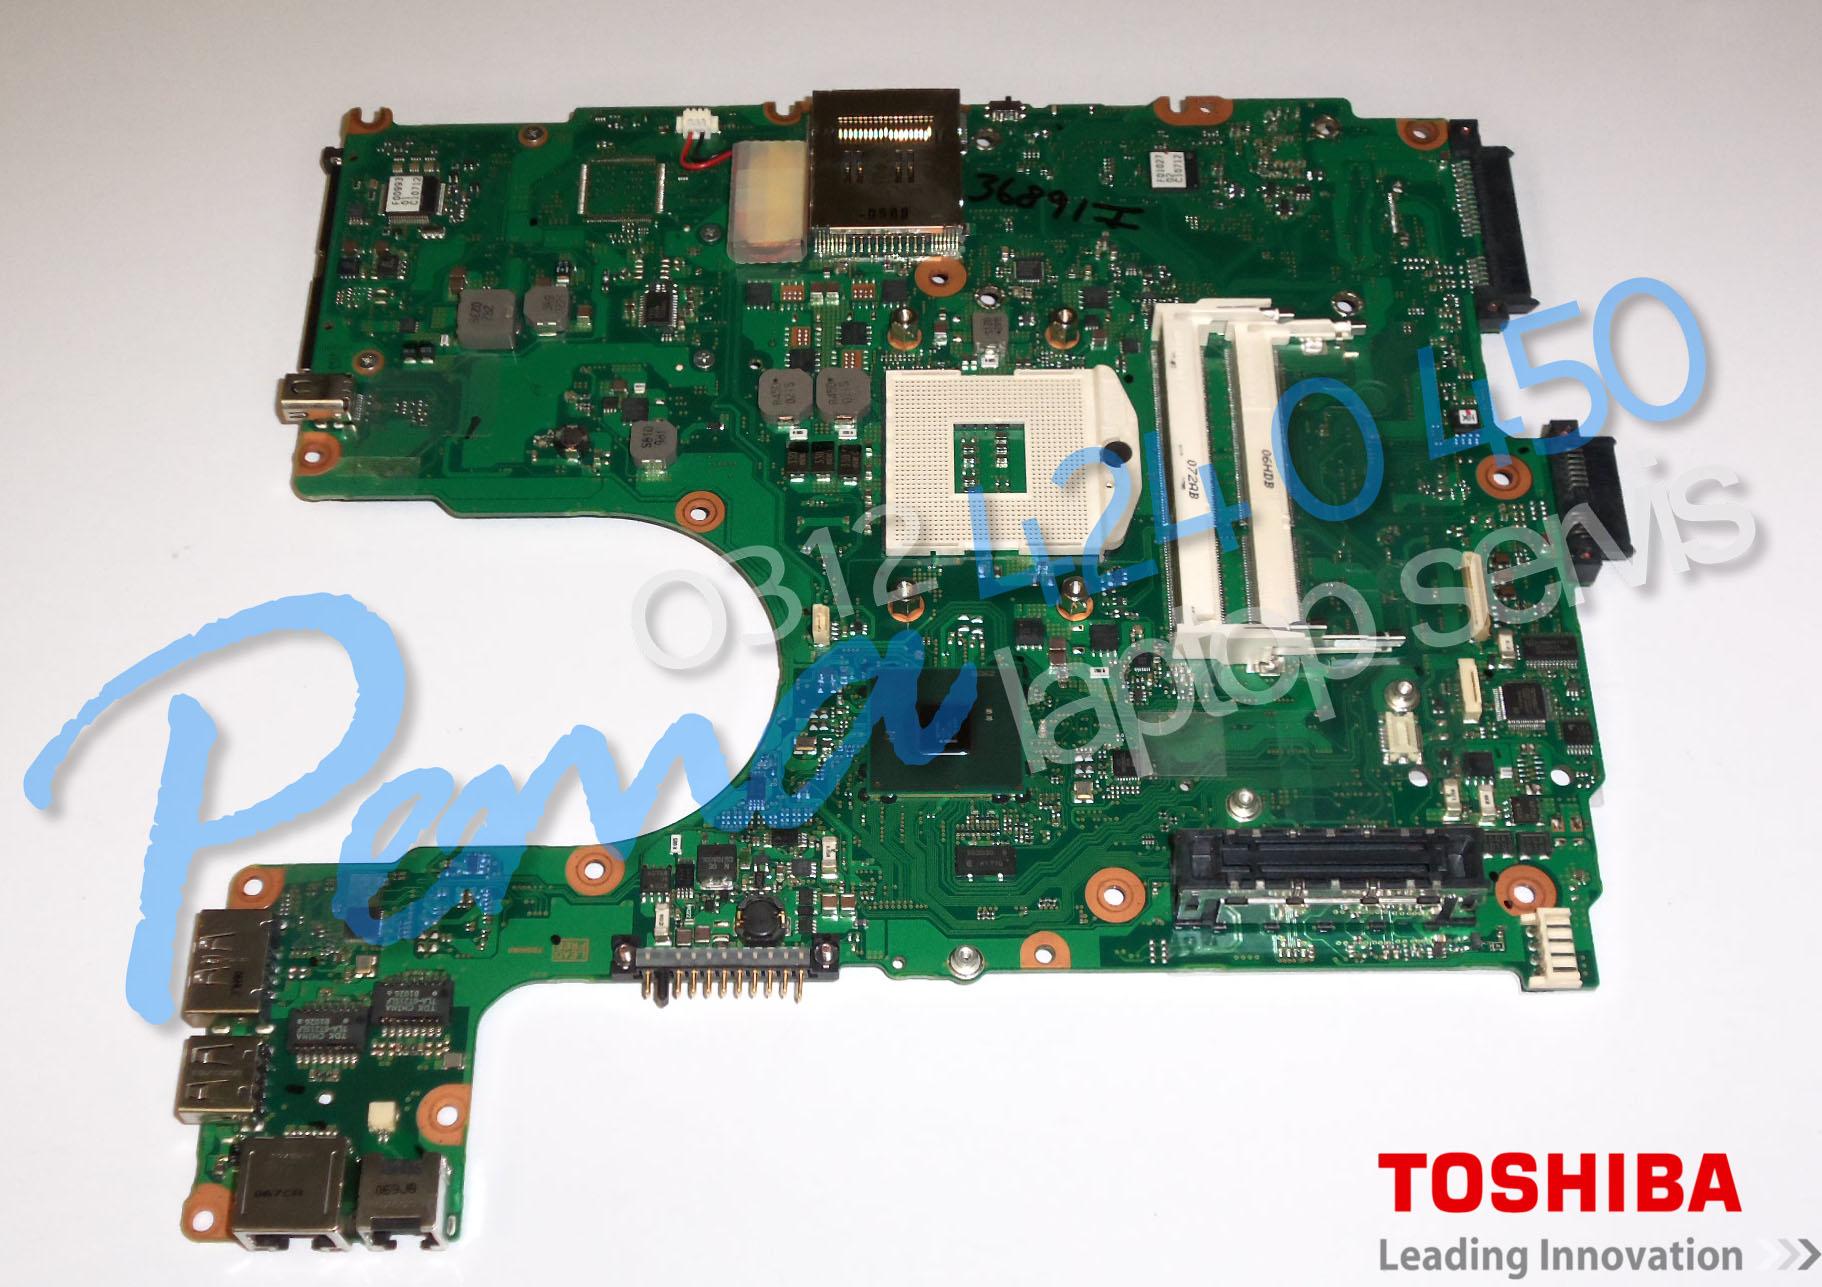 Toshiba Tecra A11 Anakart